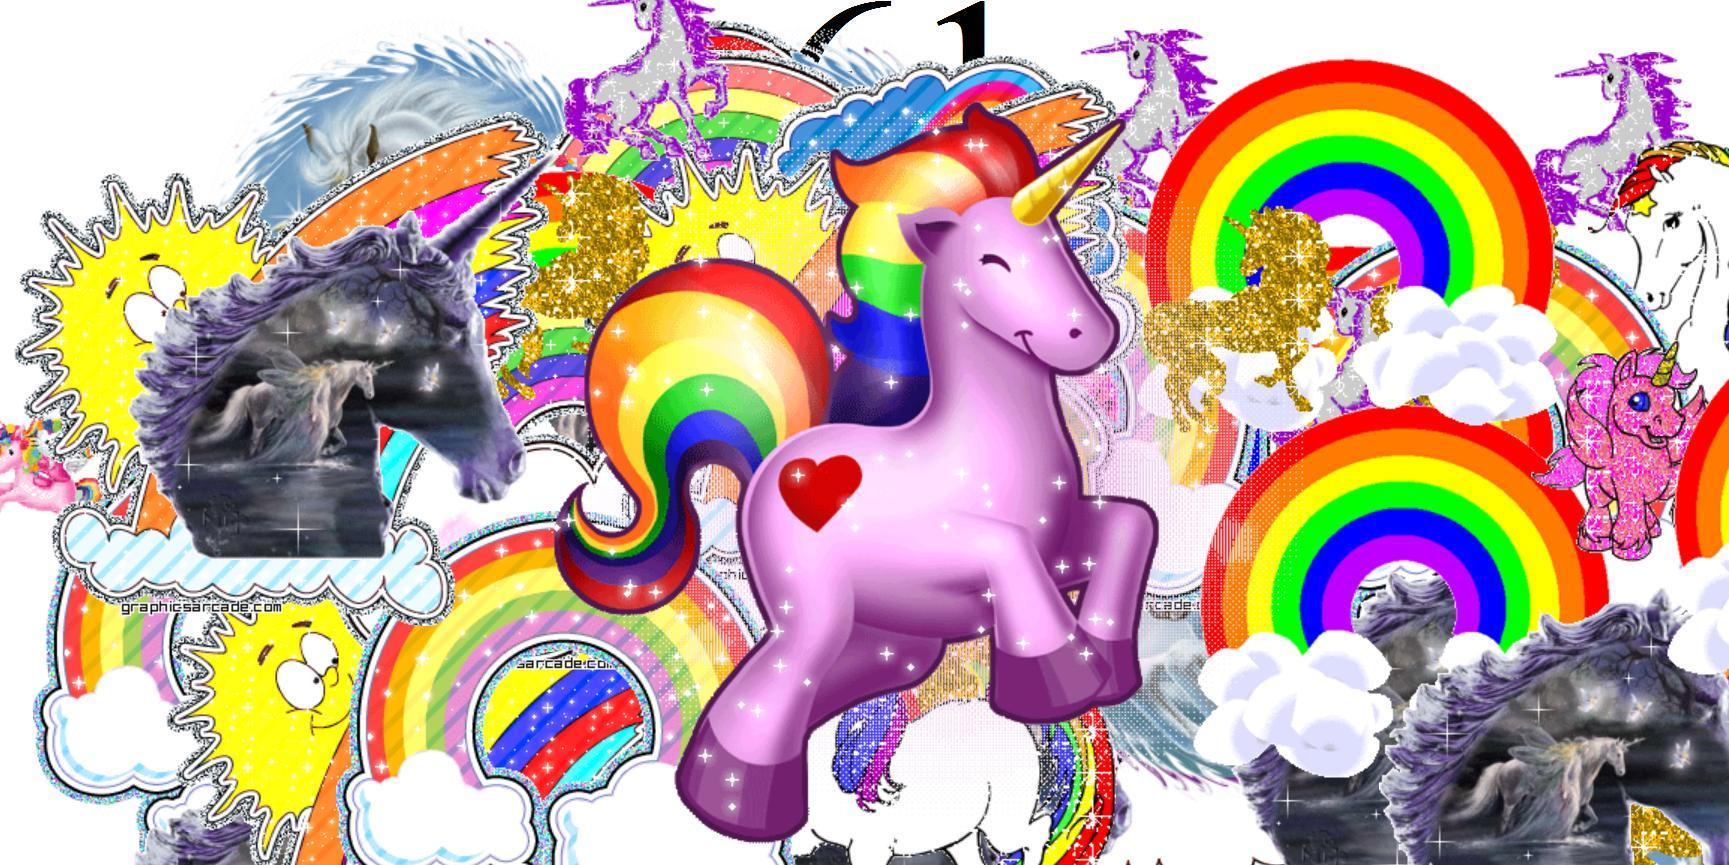 49+ Unicorn Rainbow Wallpapers on WallpaperSafari